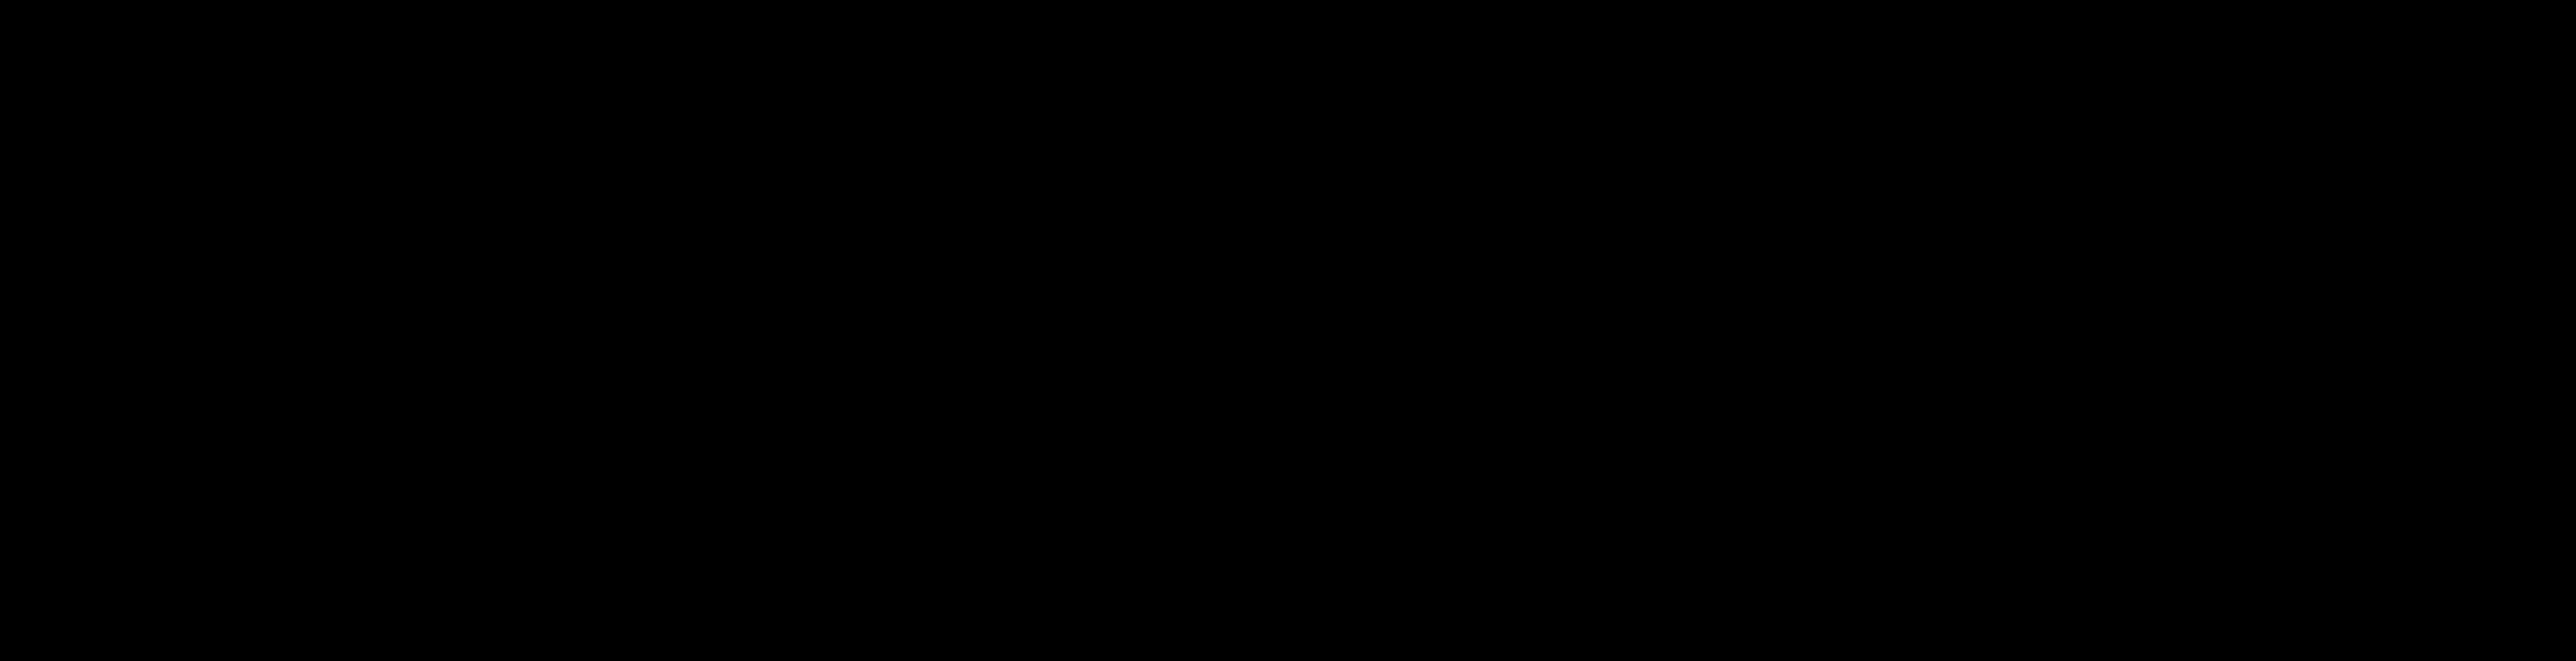 Monochrome,Line,Blackandwhite